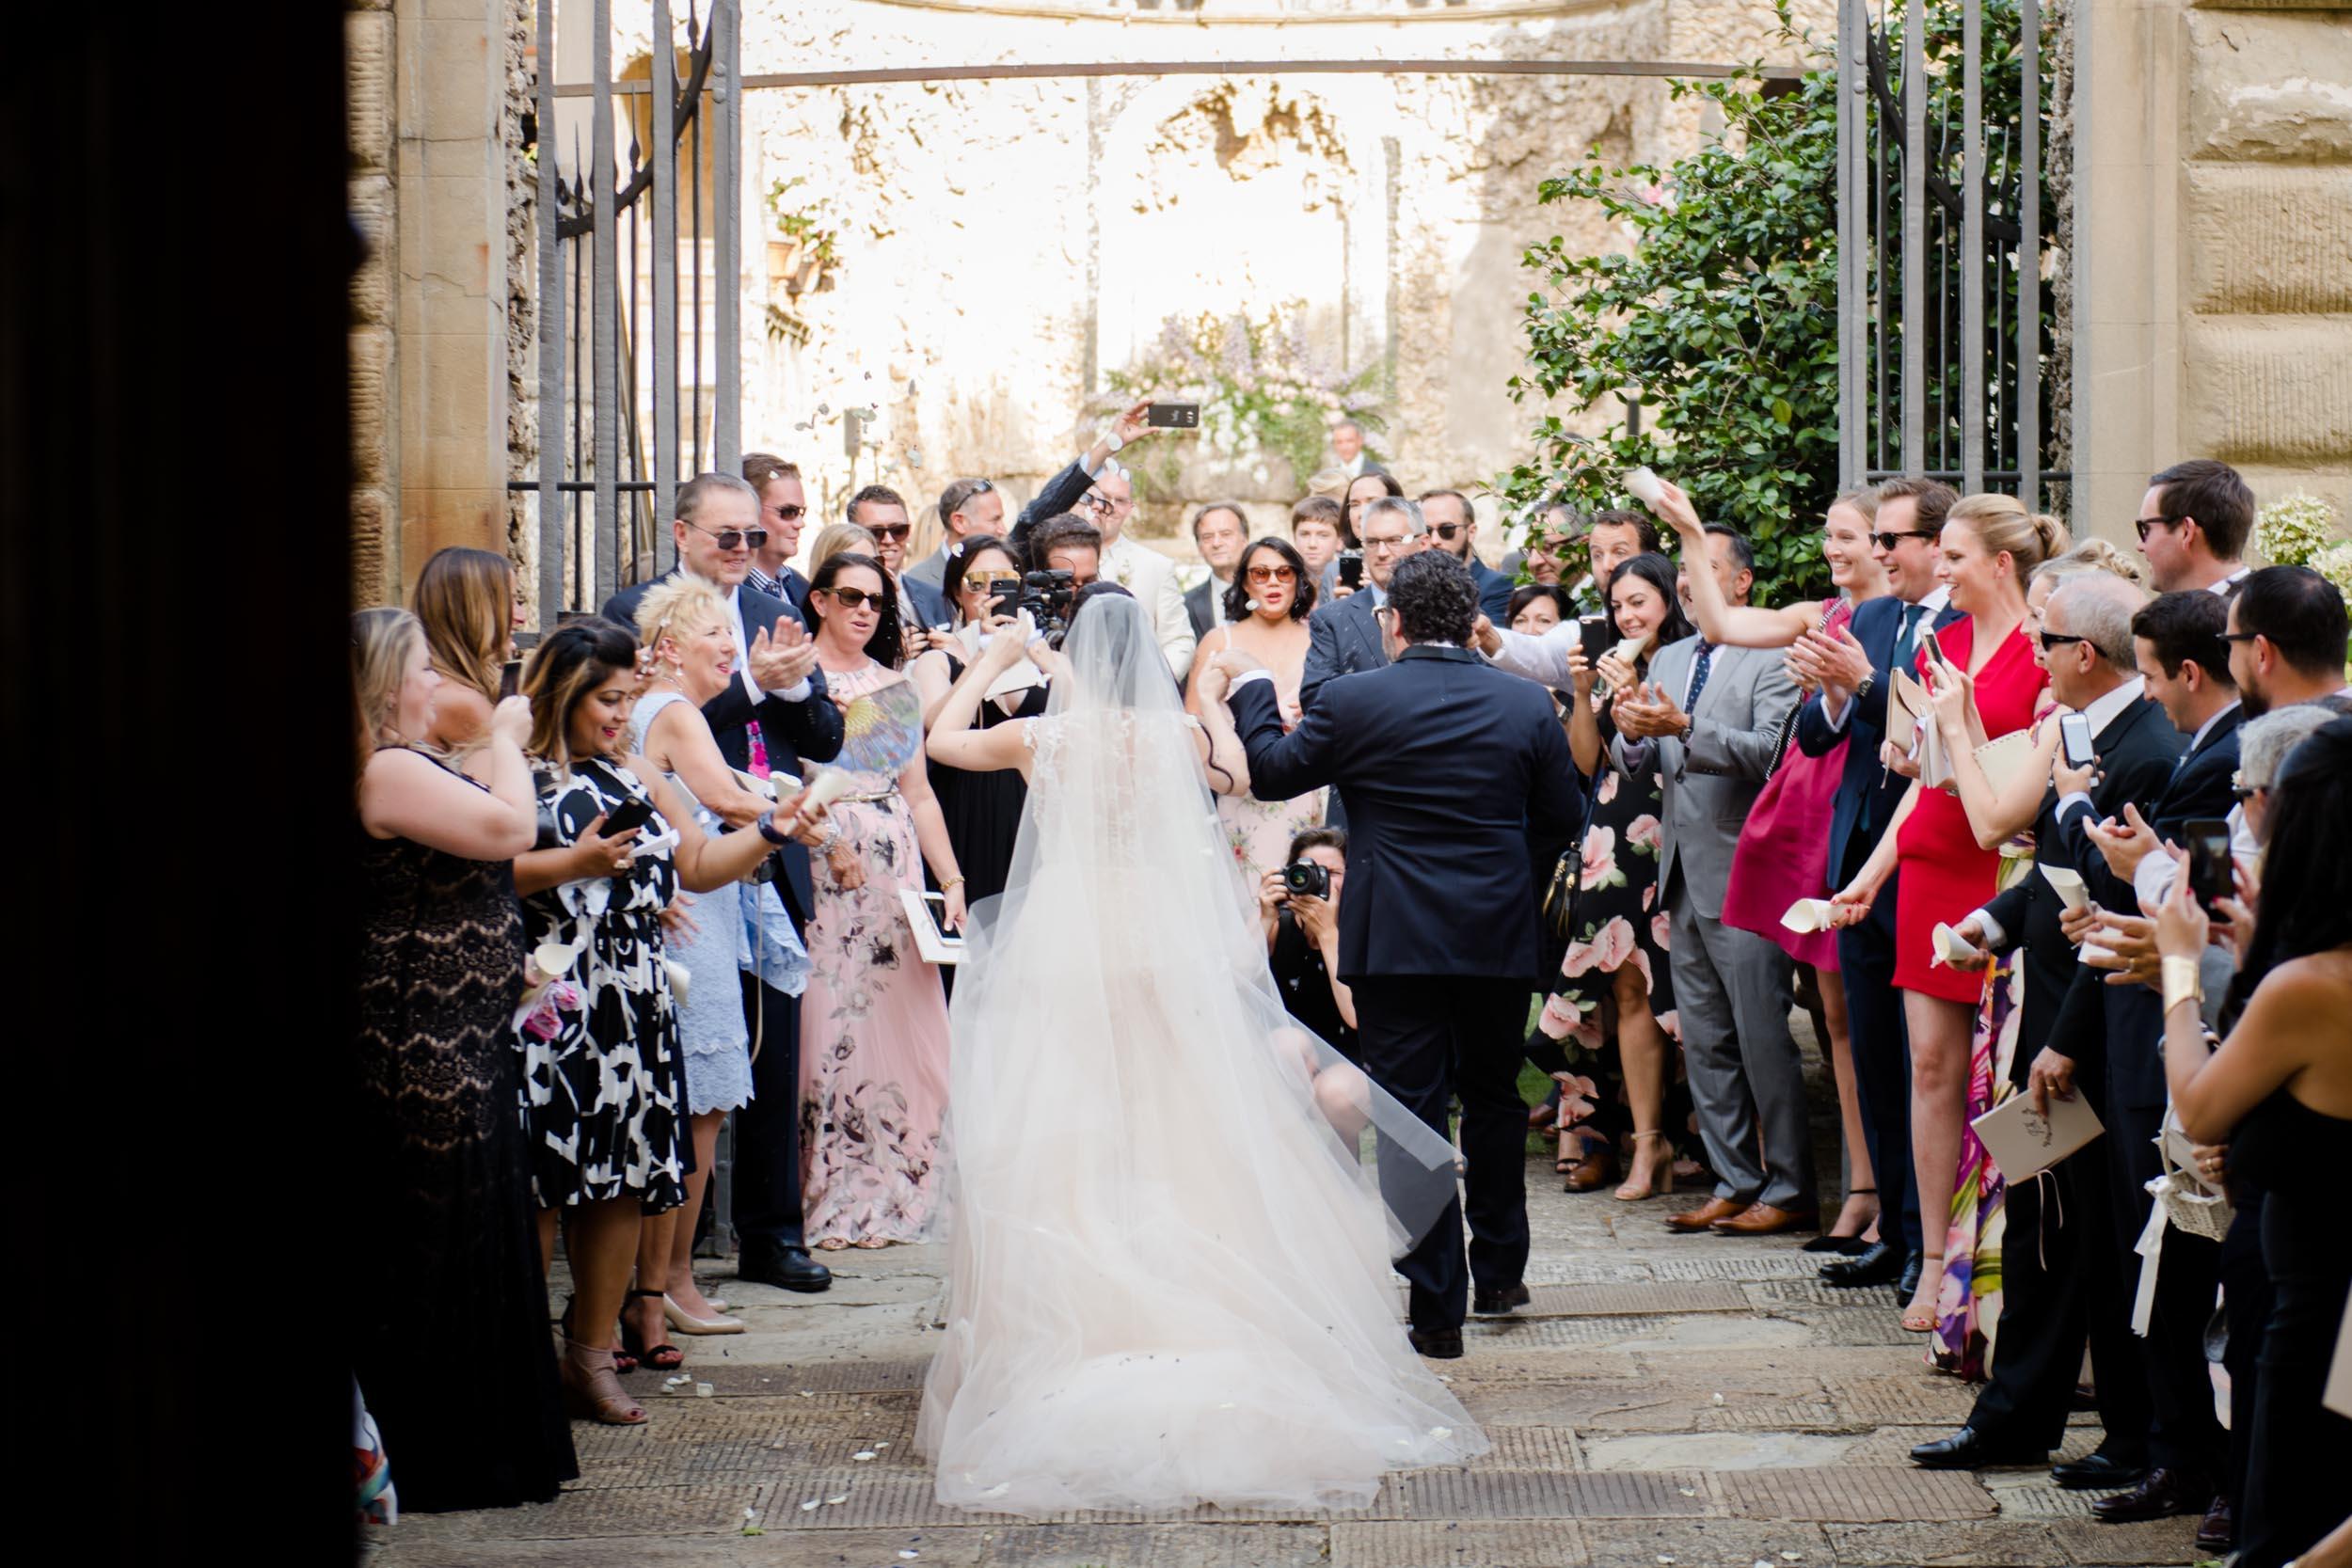 villa-gamberaia-florence-italy-destination-wedding-52.jpg